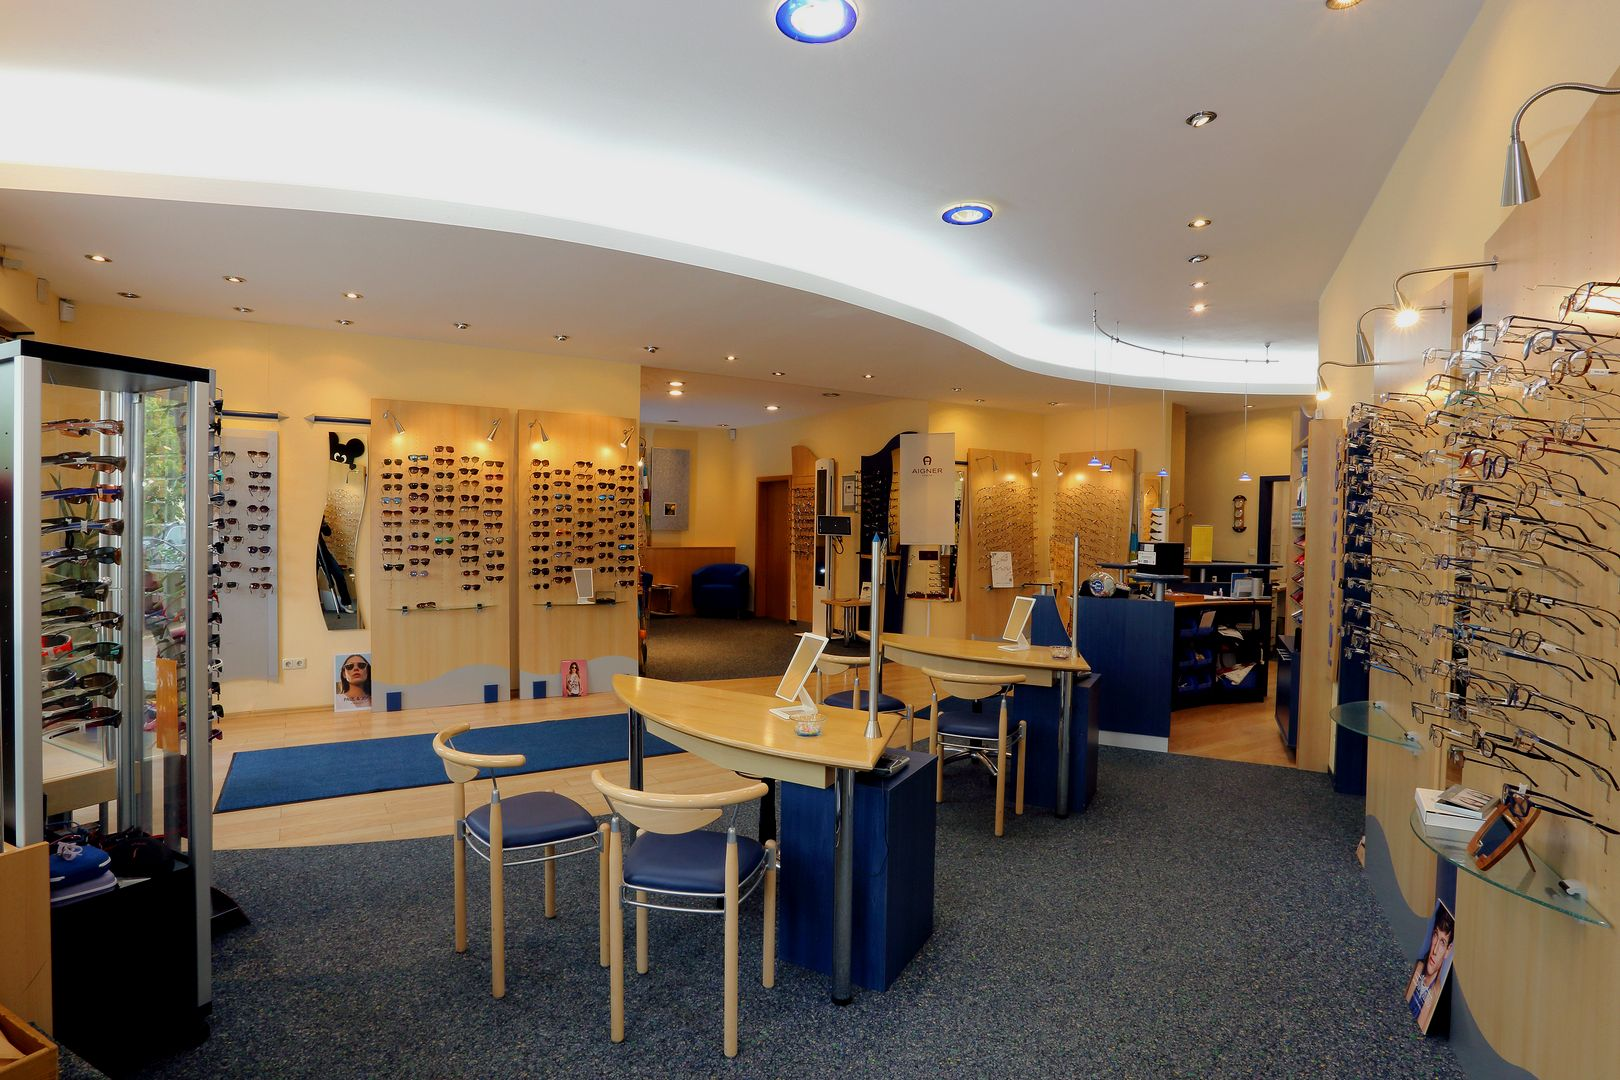 Feine Augenoptik